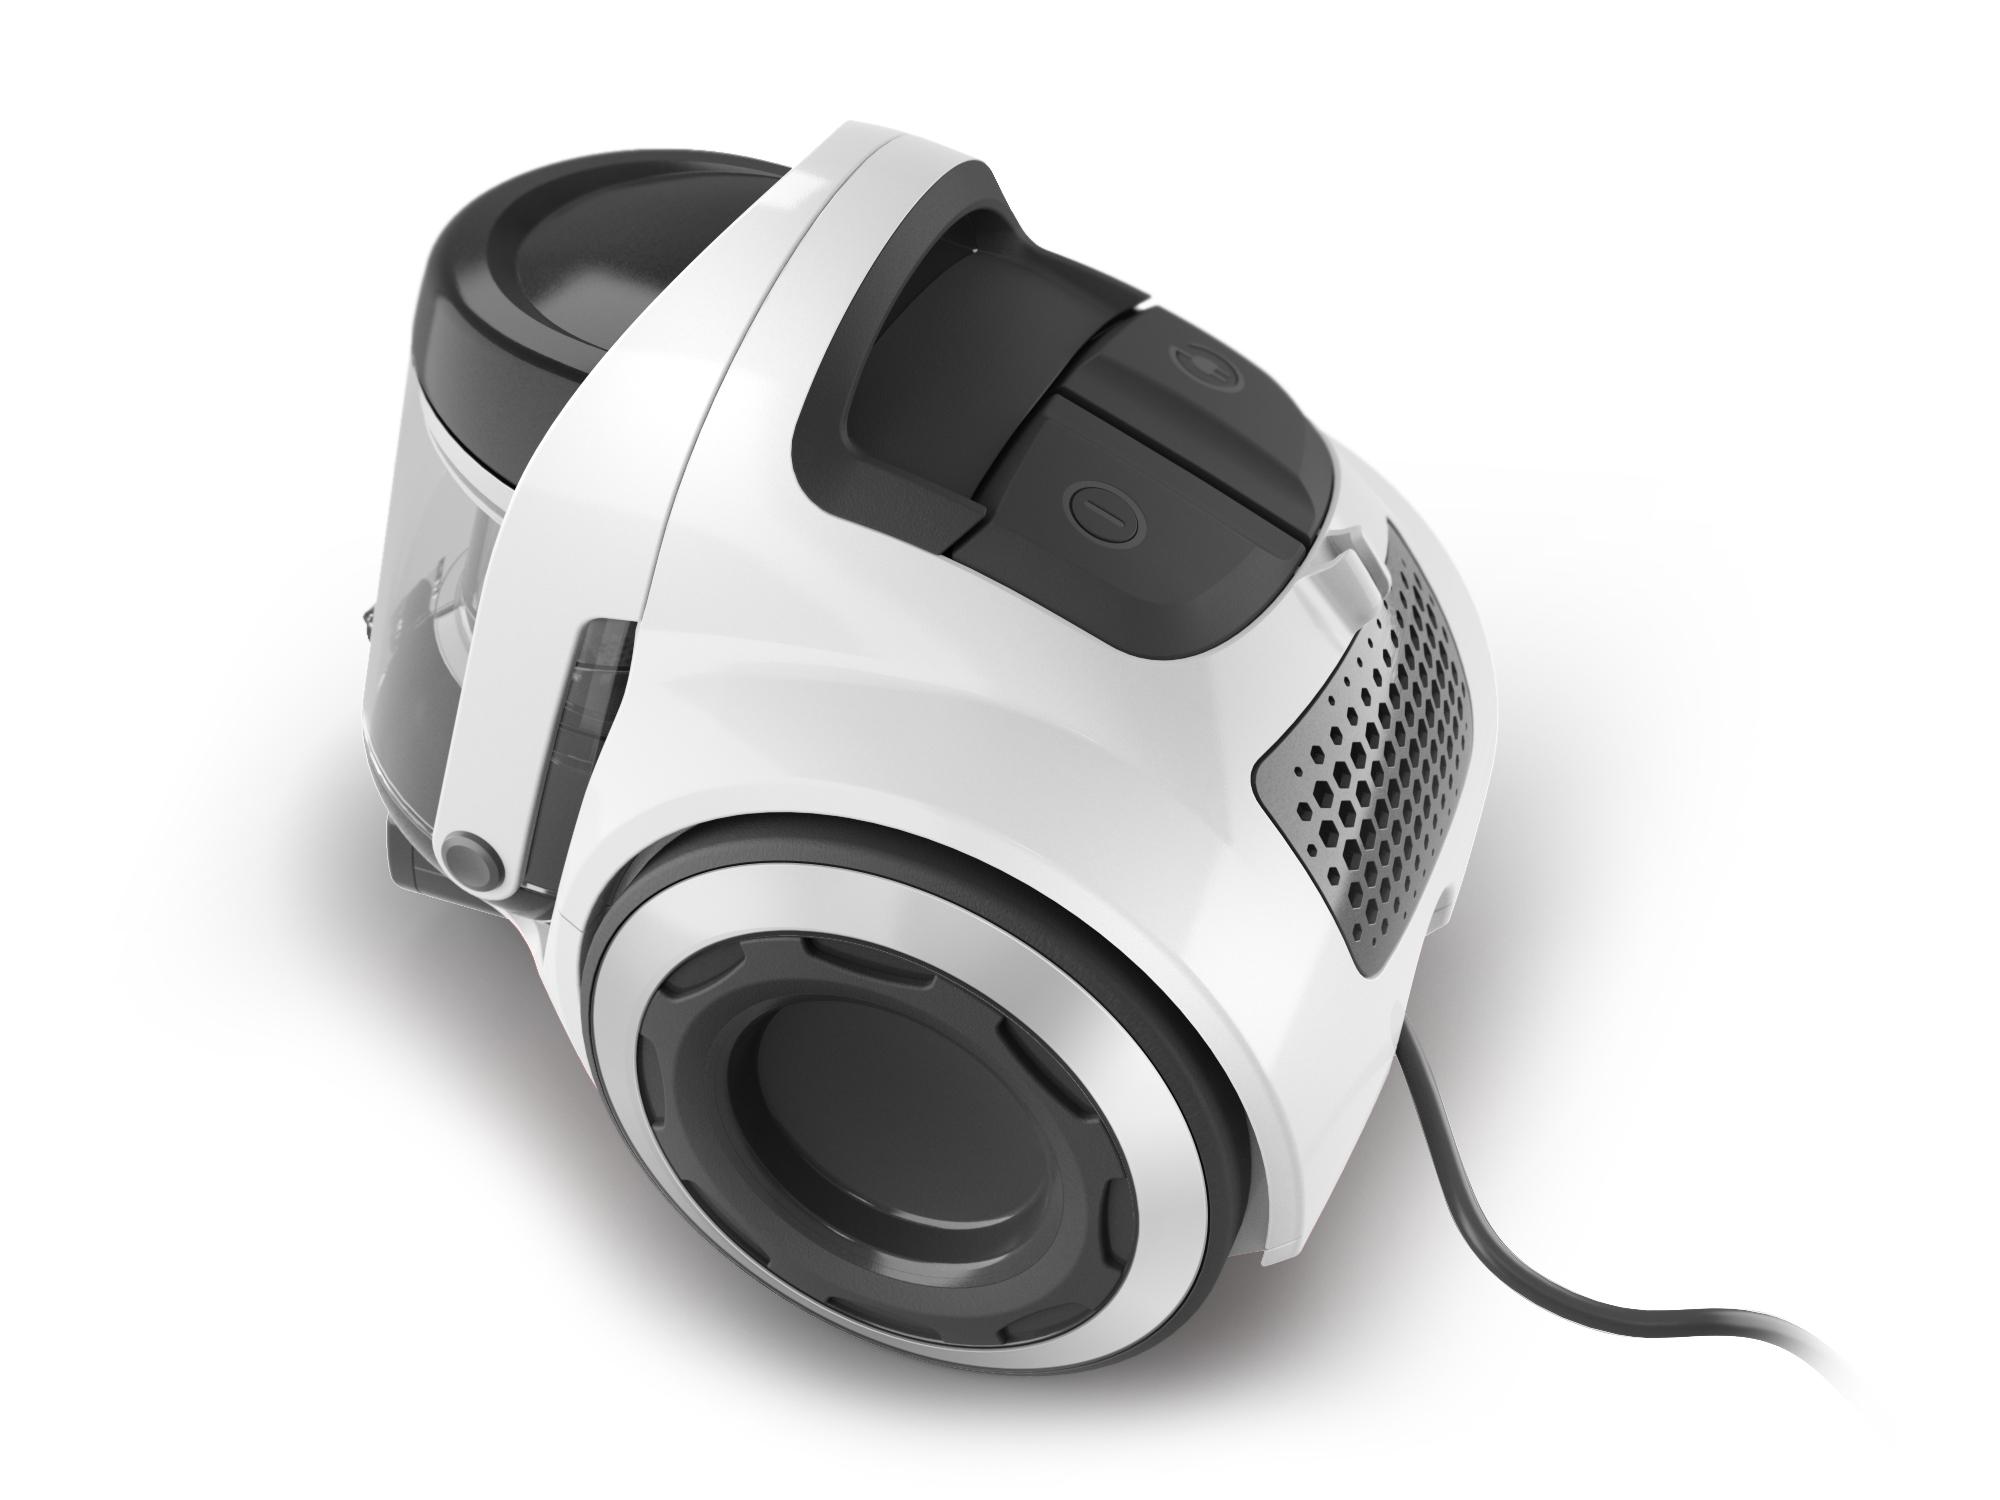 Bosch Cleann'n bagless vacuum cleaner